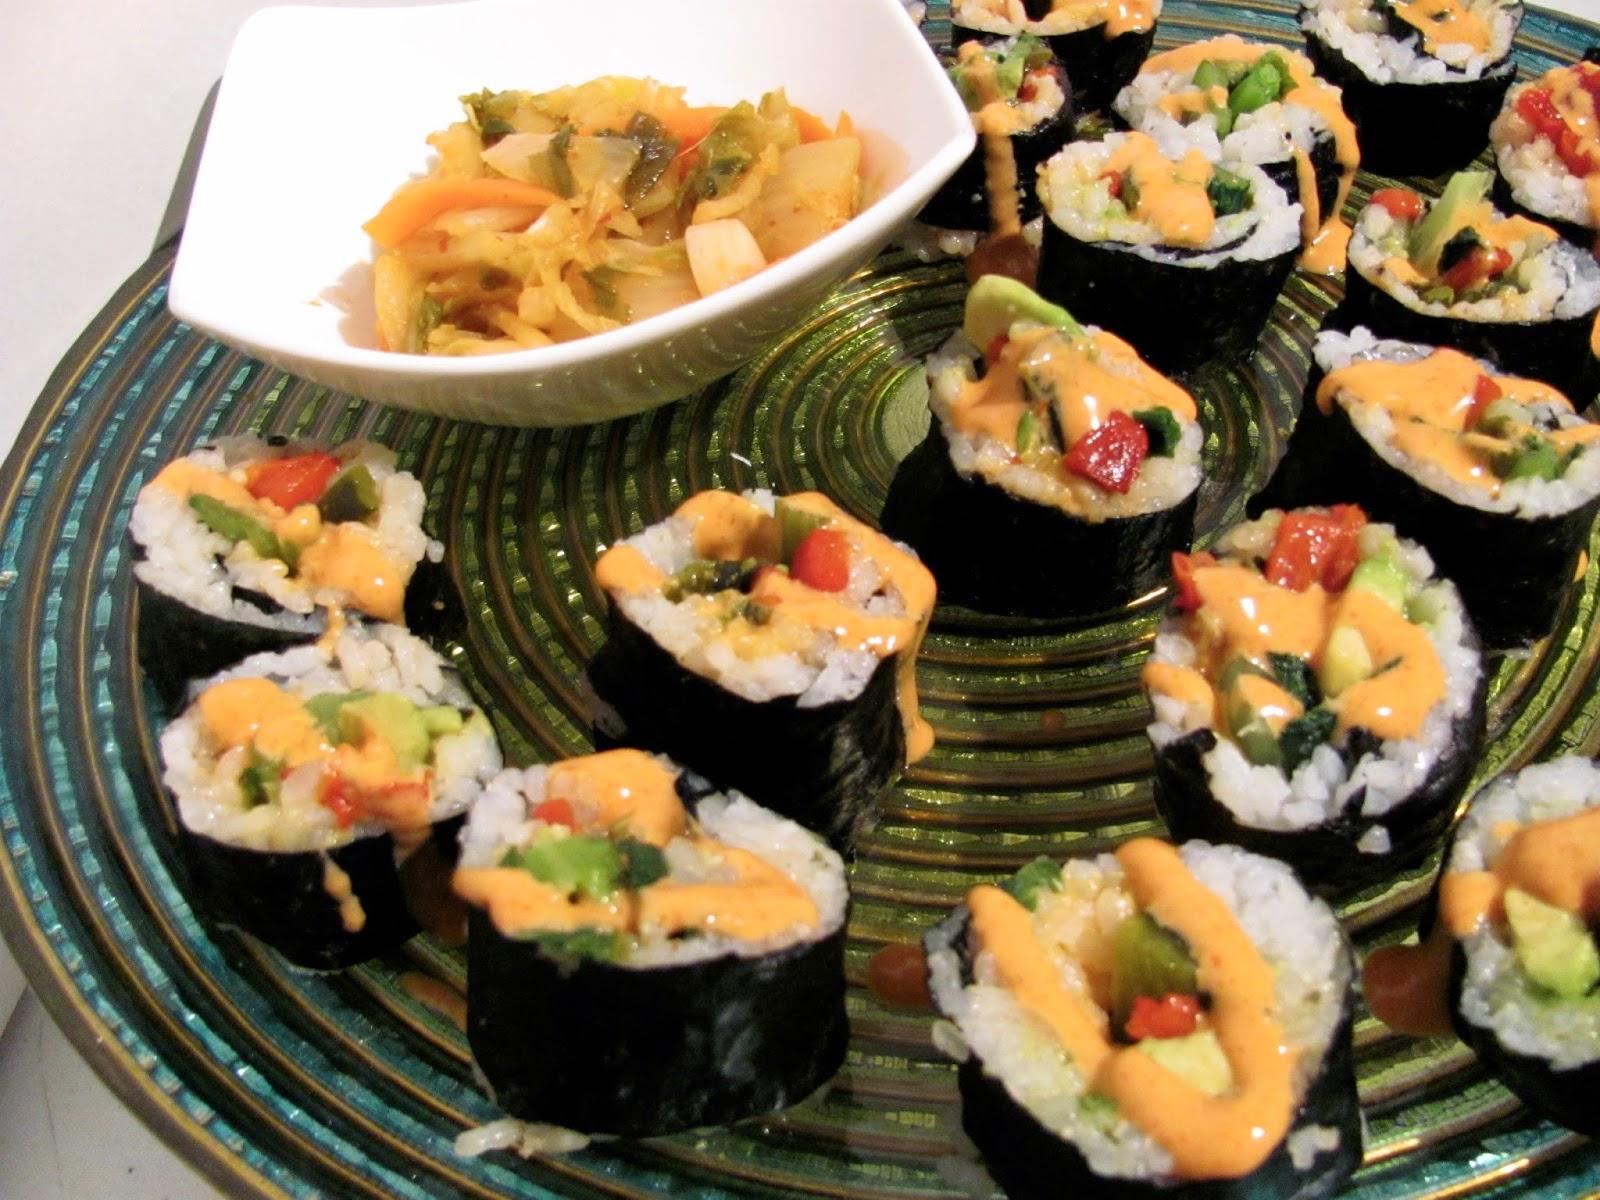 Vegan Sushi | Spicy Avocado Roll